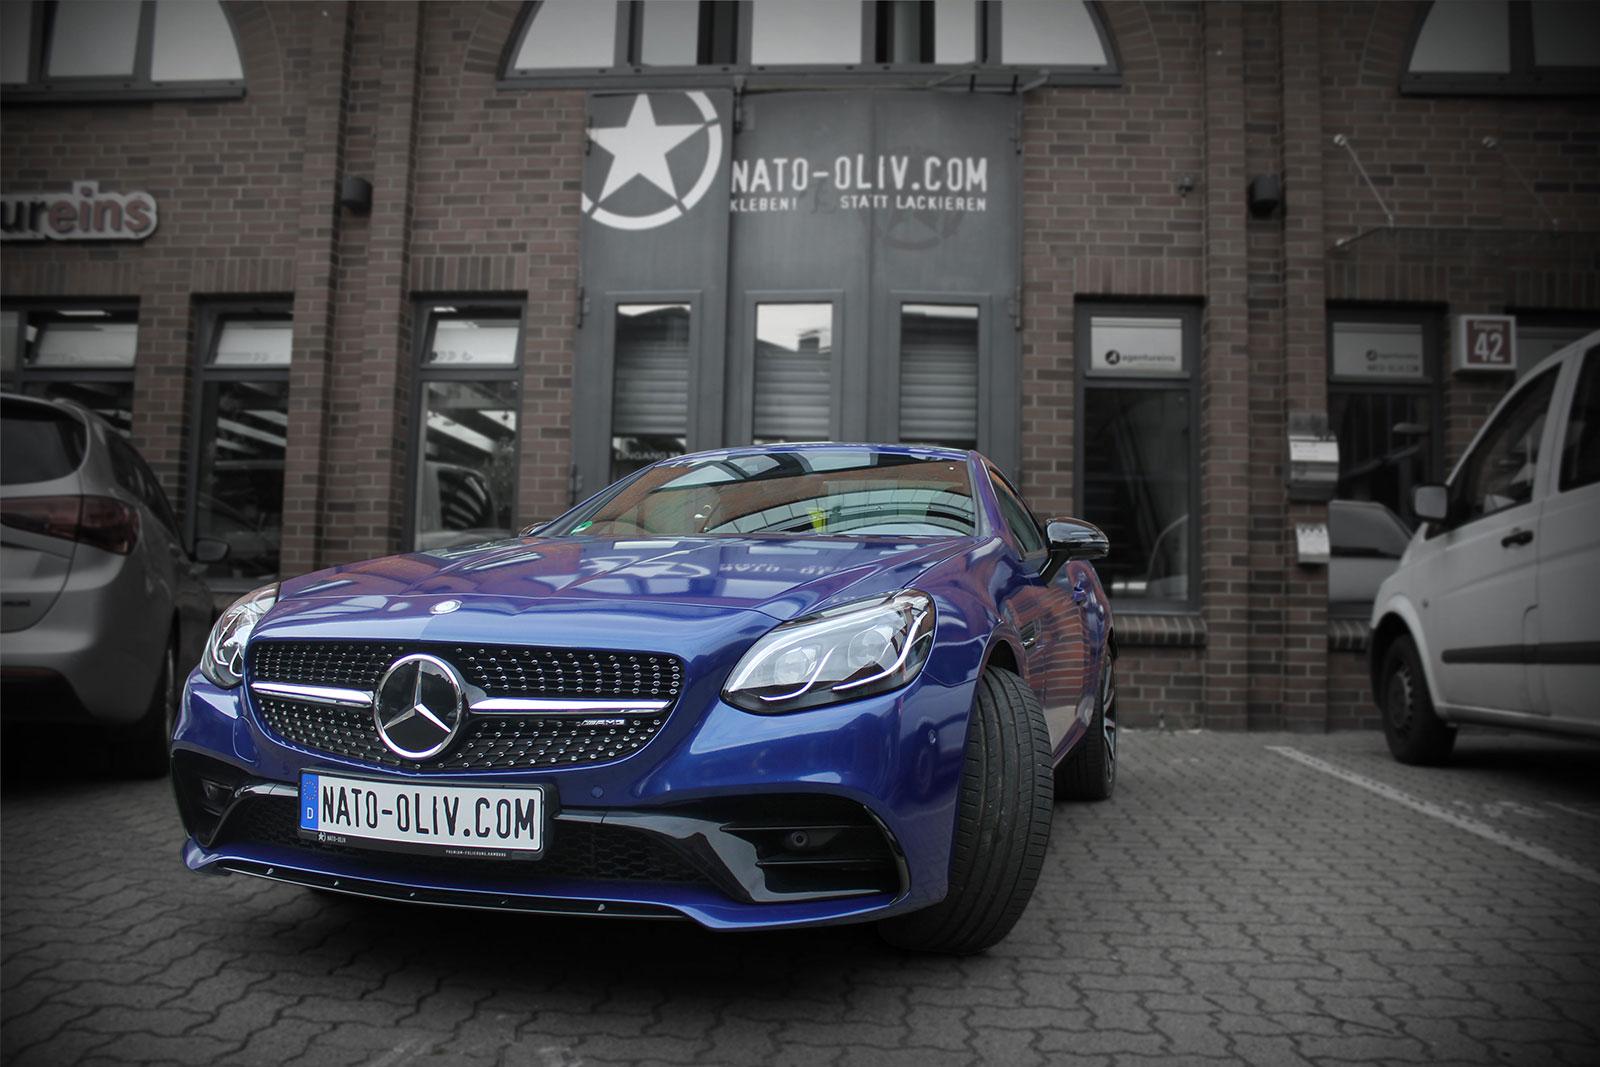 Mercedes-SLC-43-AMG-Silber-auf-Blau-3M-G217-Premium-plus